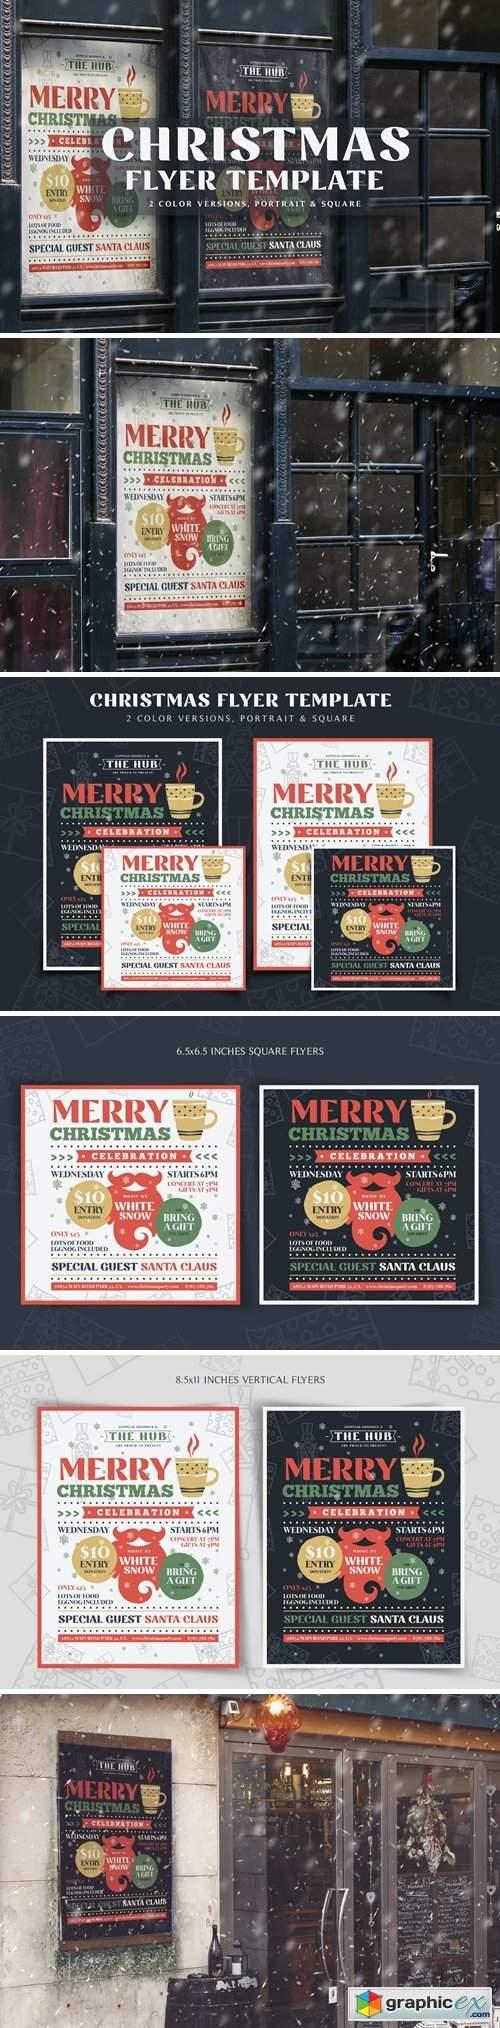 Christmas Flyer Template Vol.1